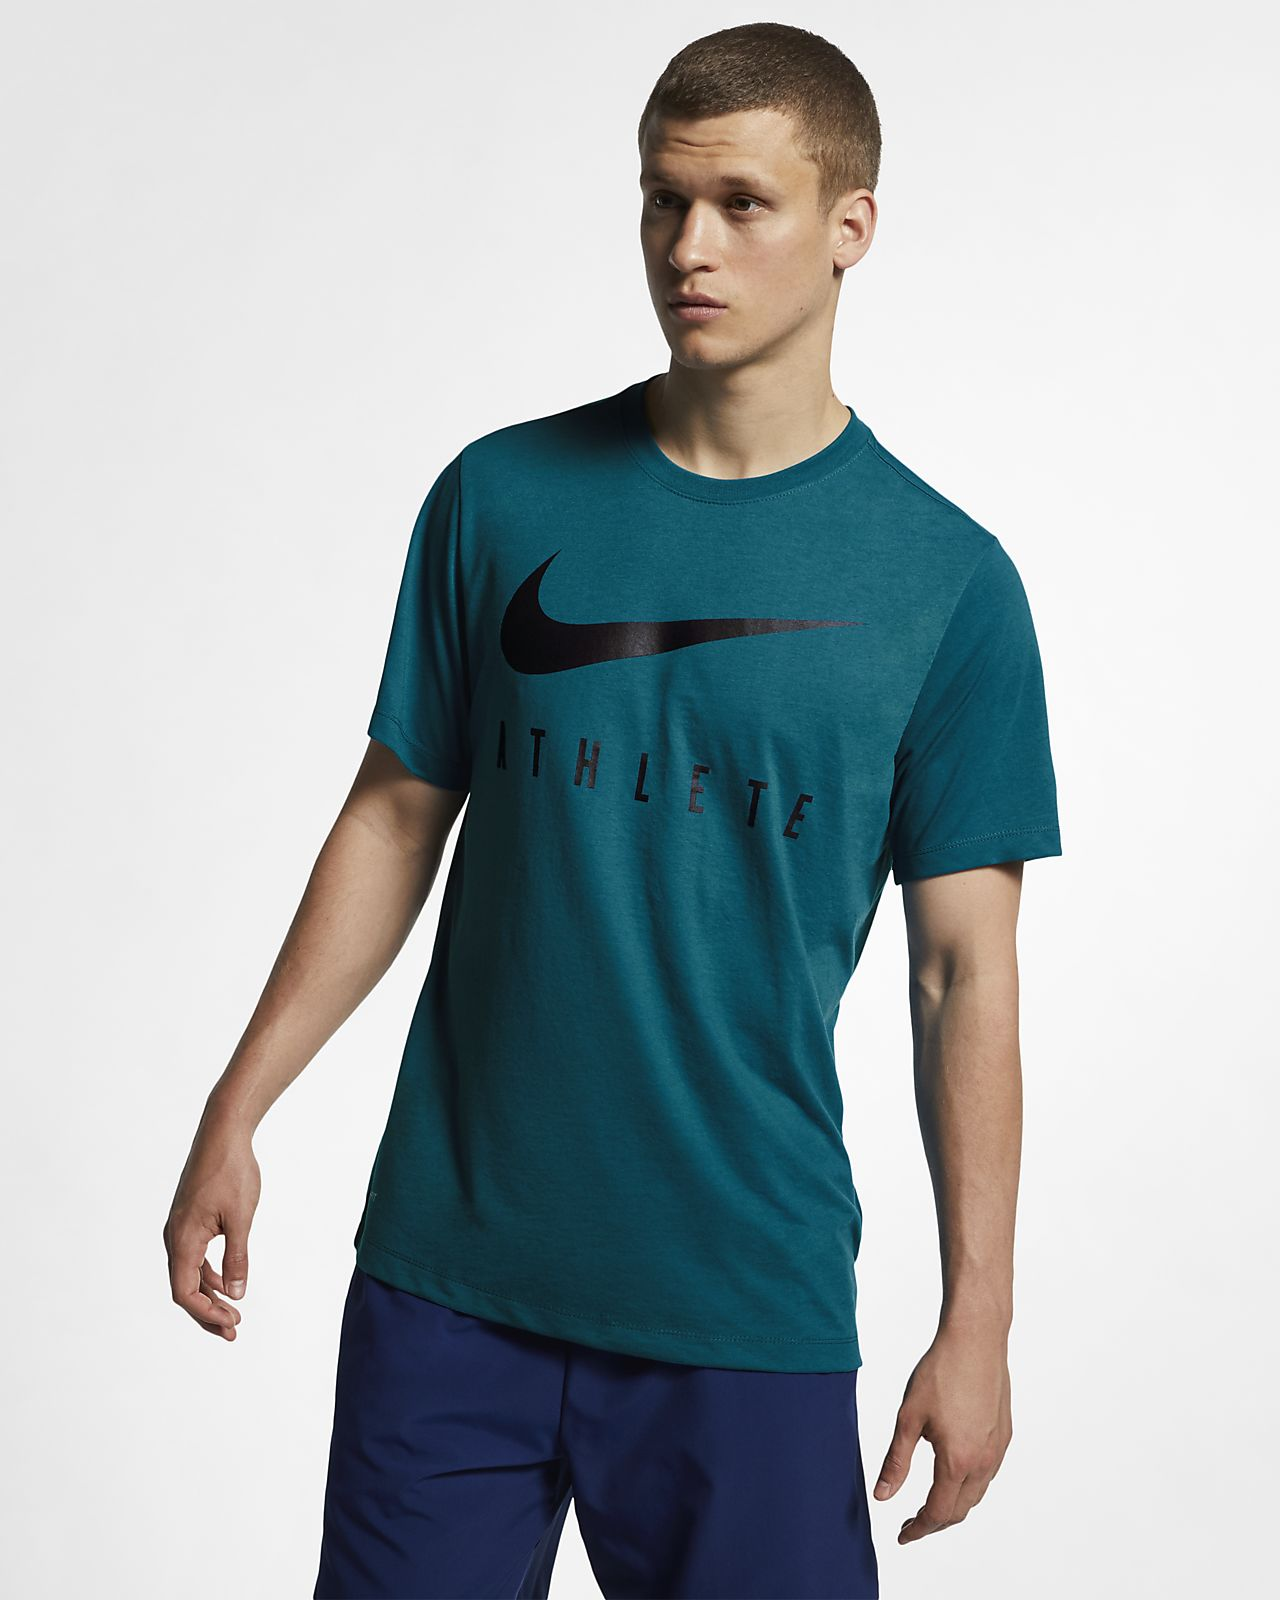 812eed2e Nike Dri-FIT-trænings-T-shirt til mænd. Nike.com DK